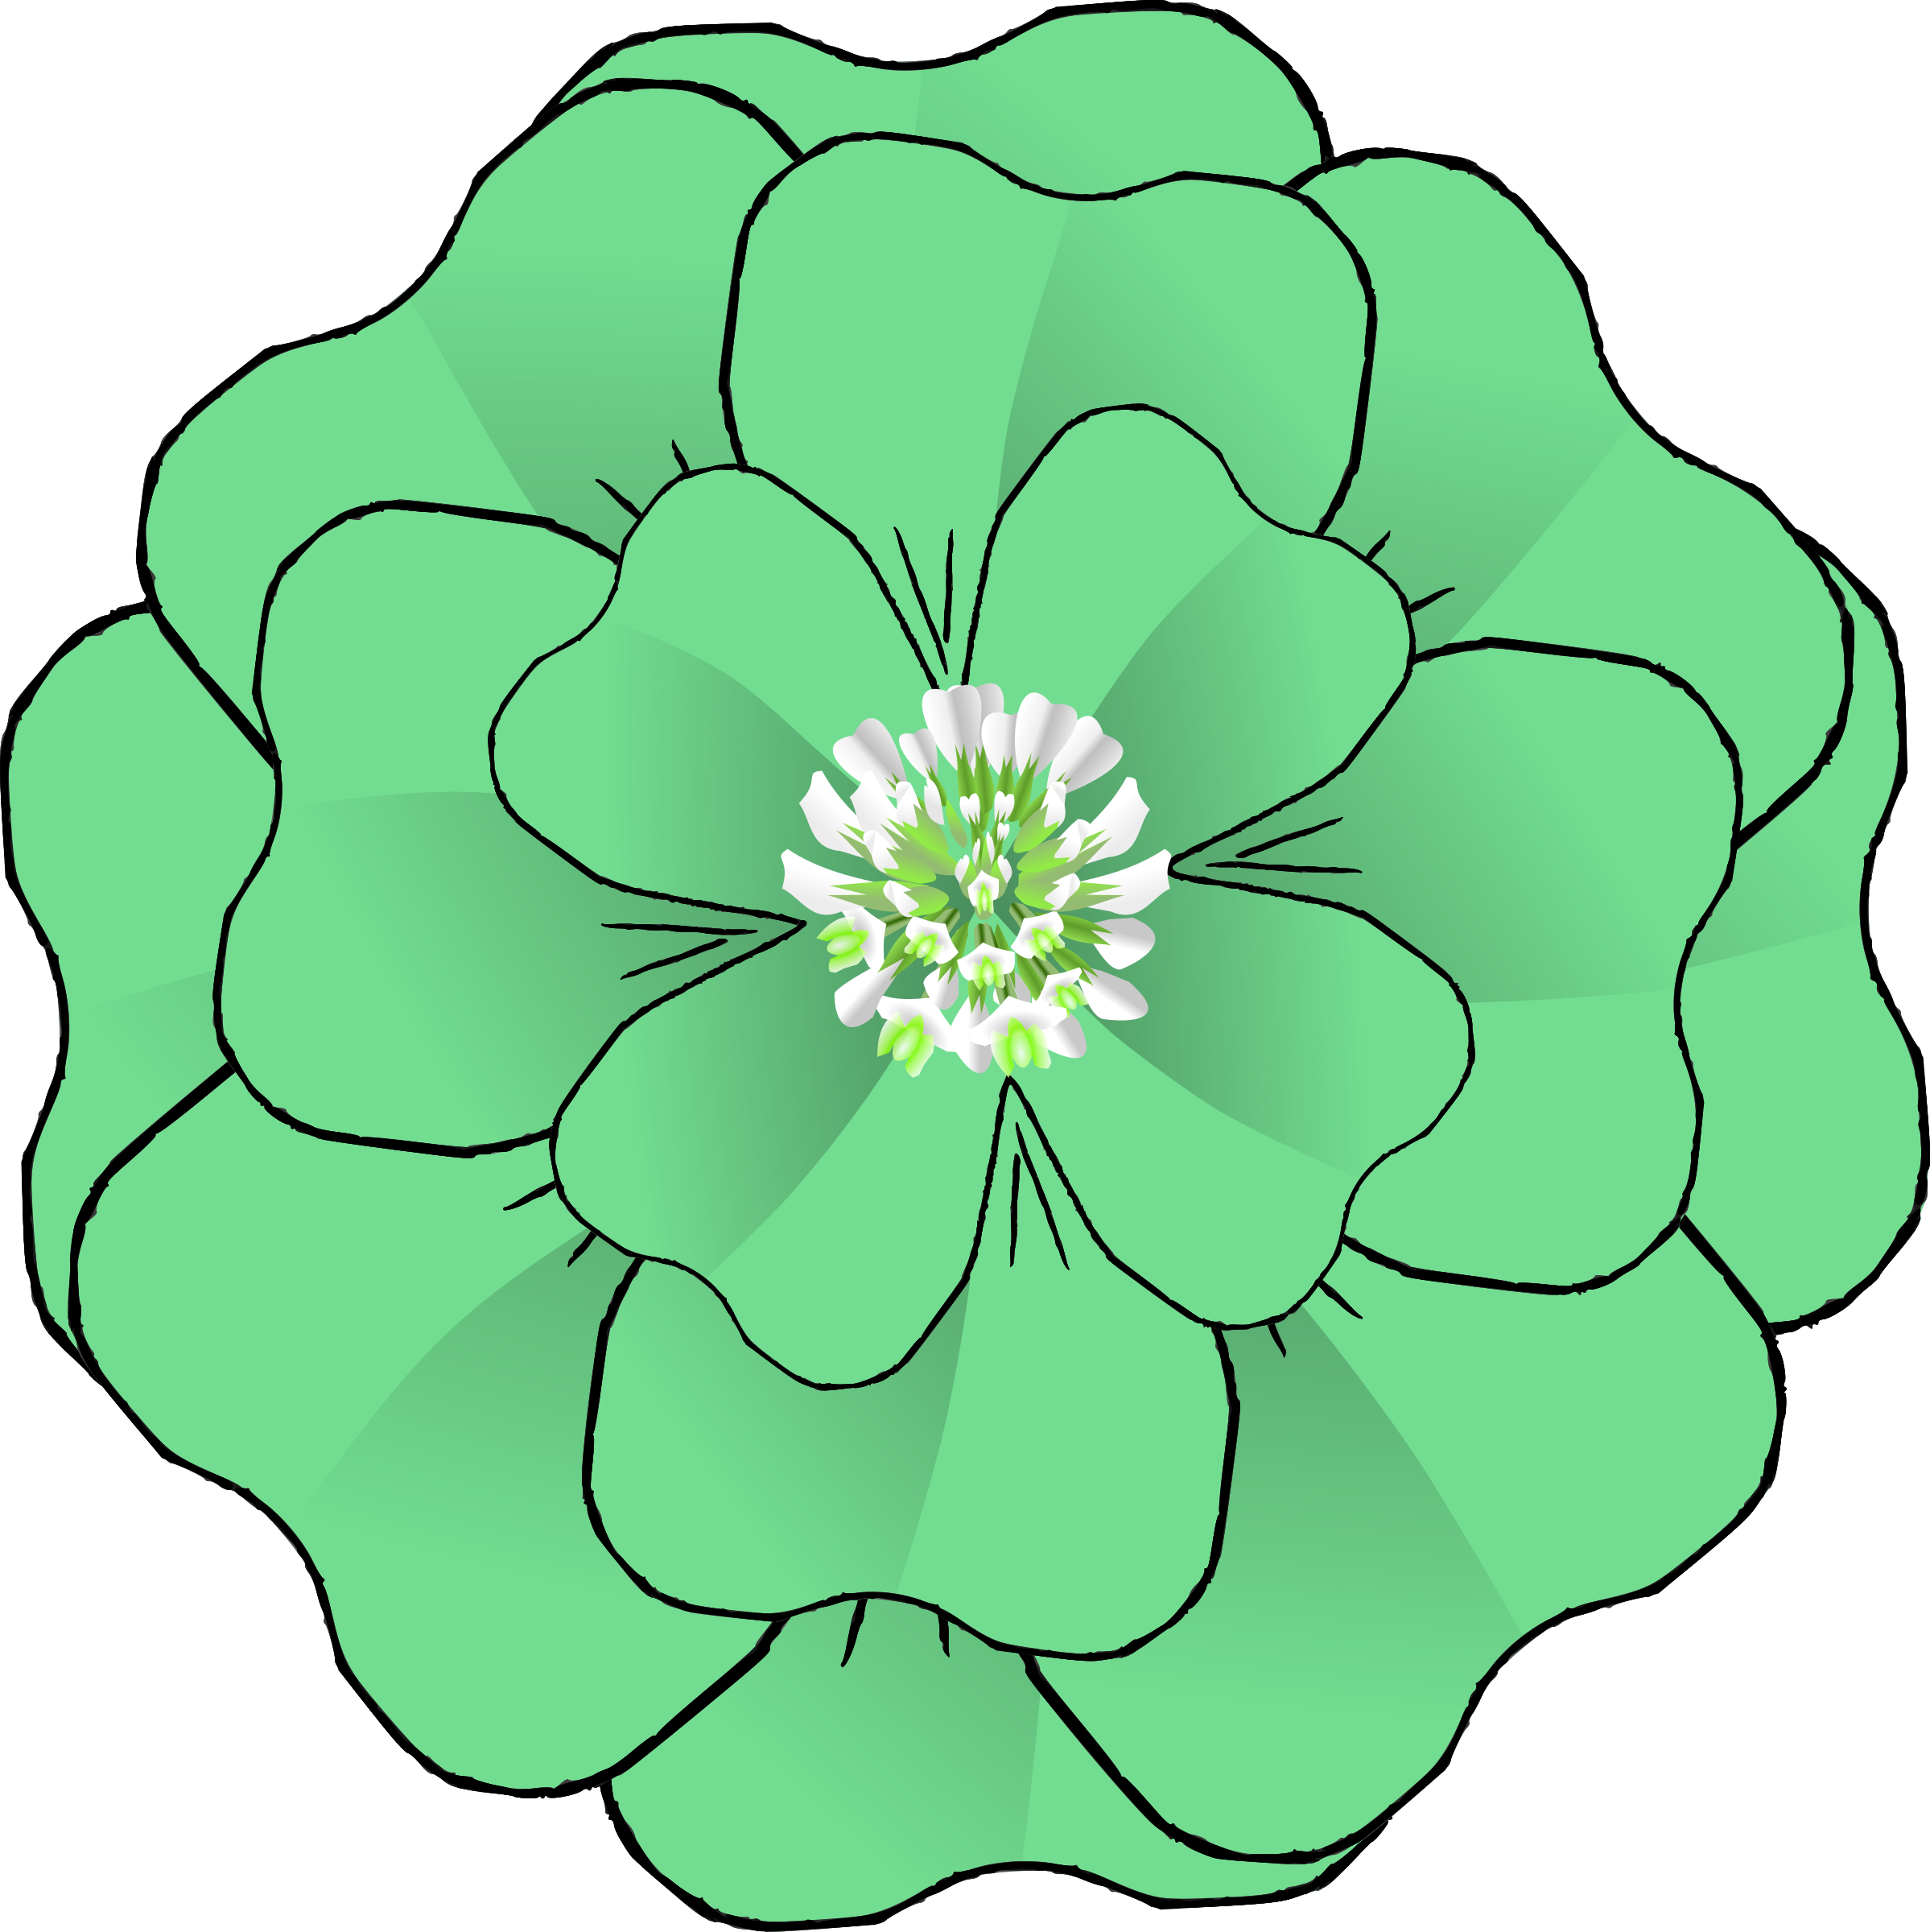 Four petal flower clipart svg black and white stock Clipart - Flower 4 Leaf Clover Corsage-resubmission svg black and white stock